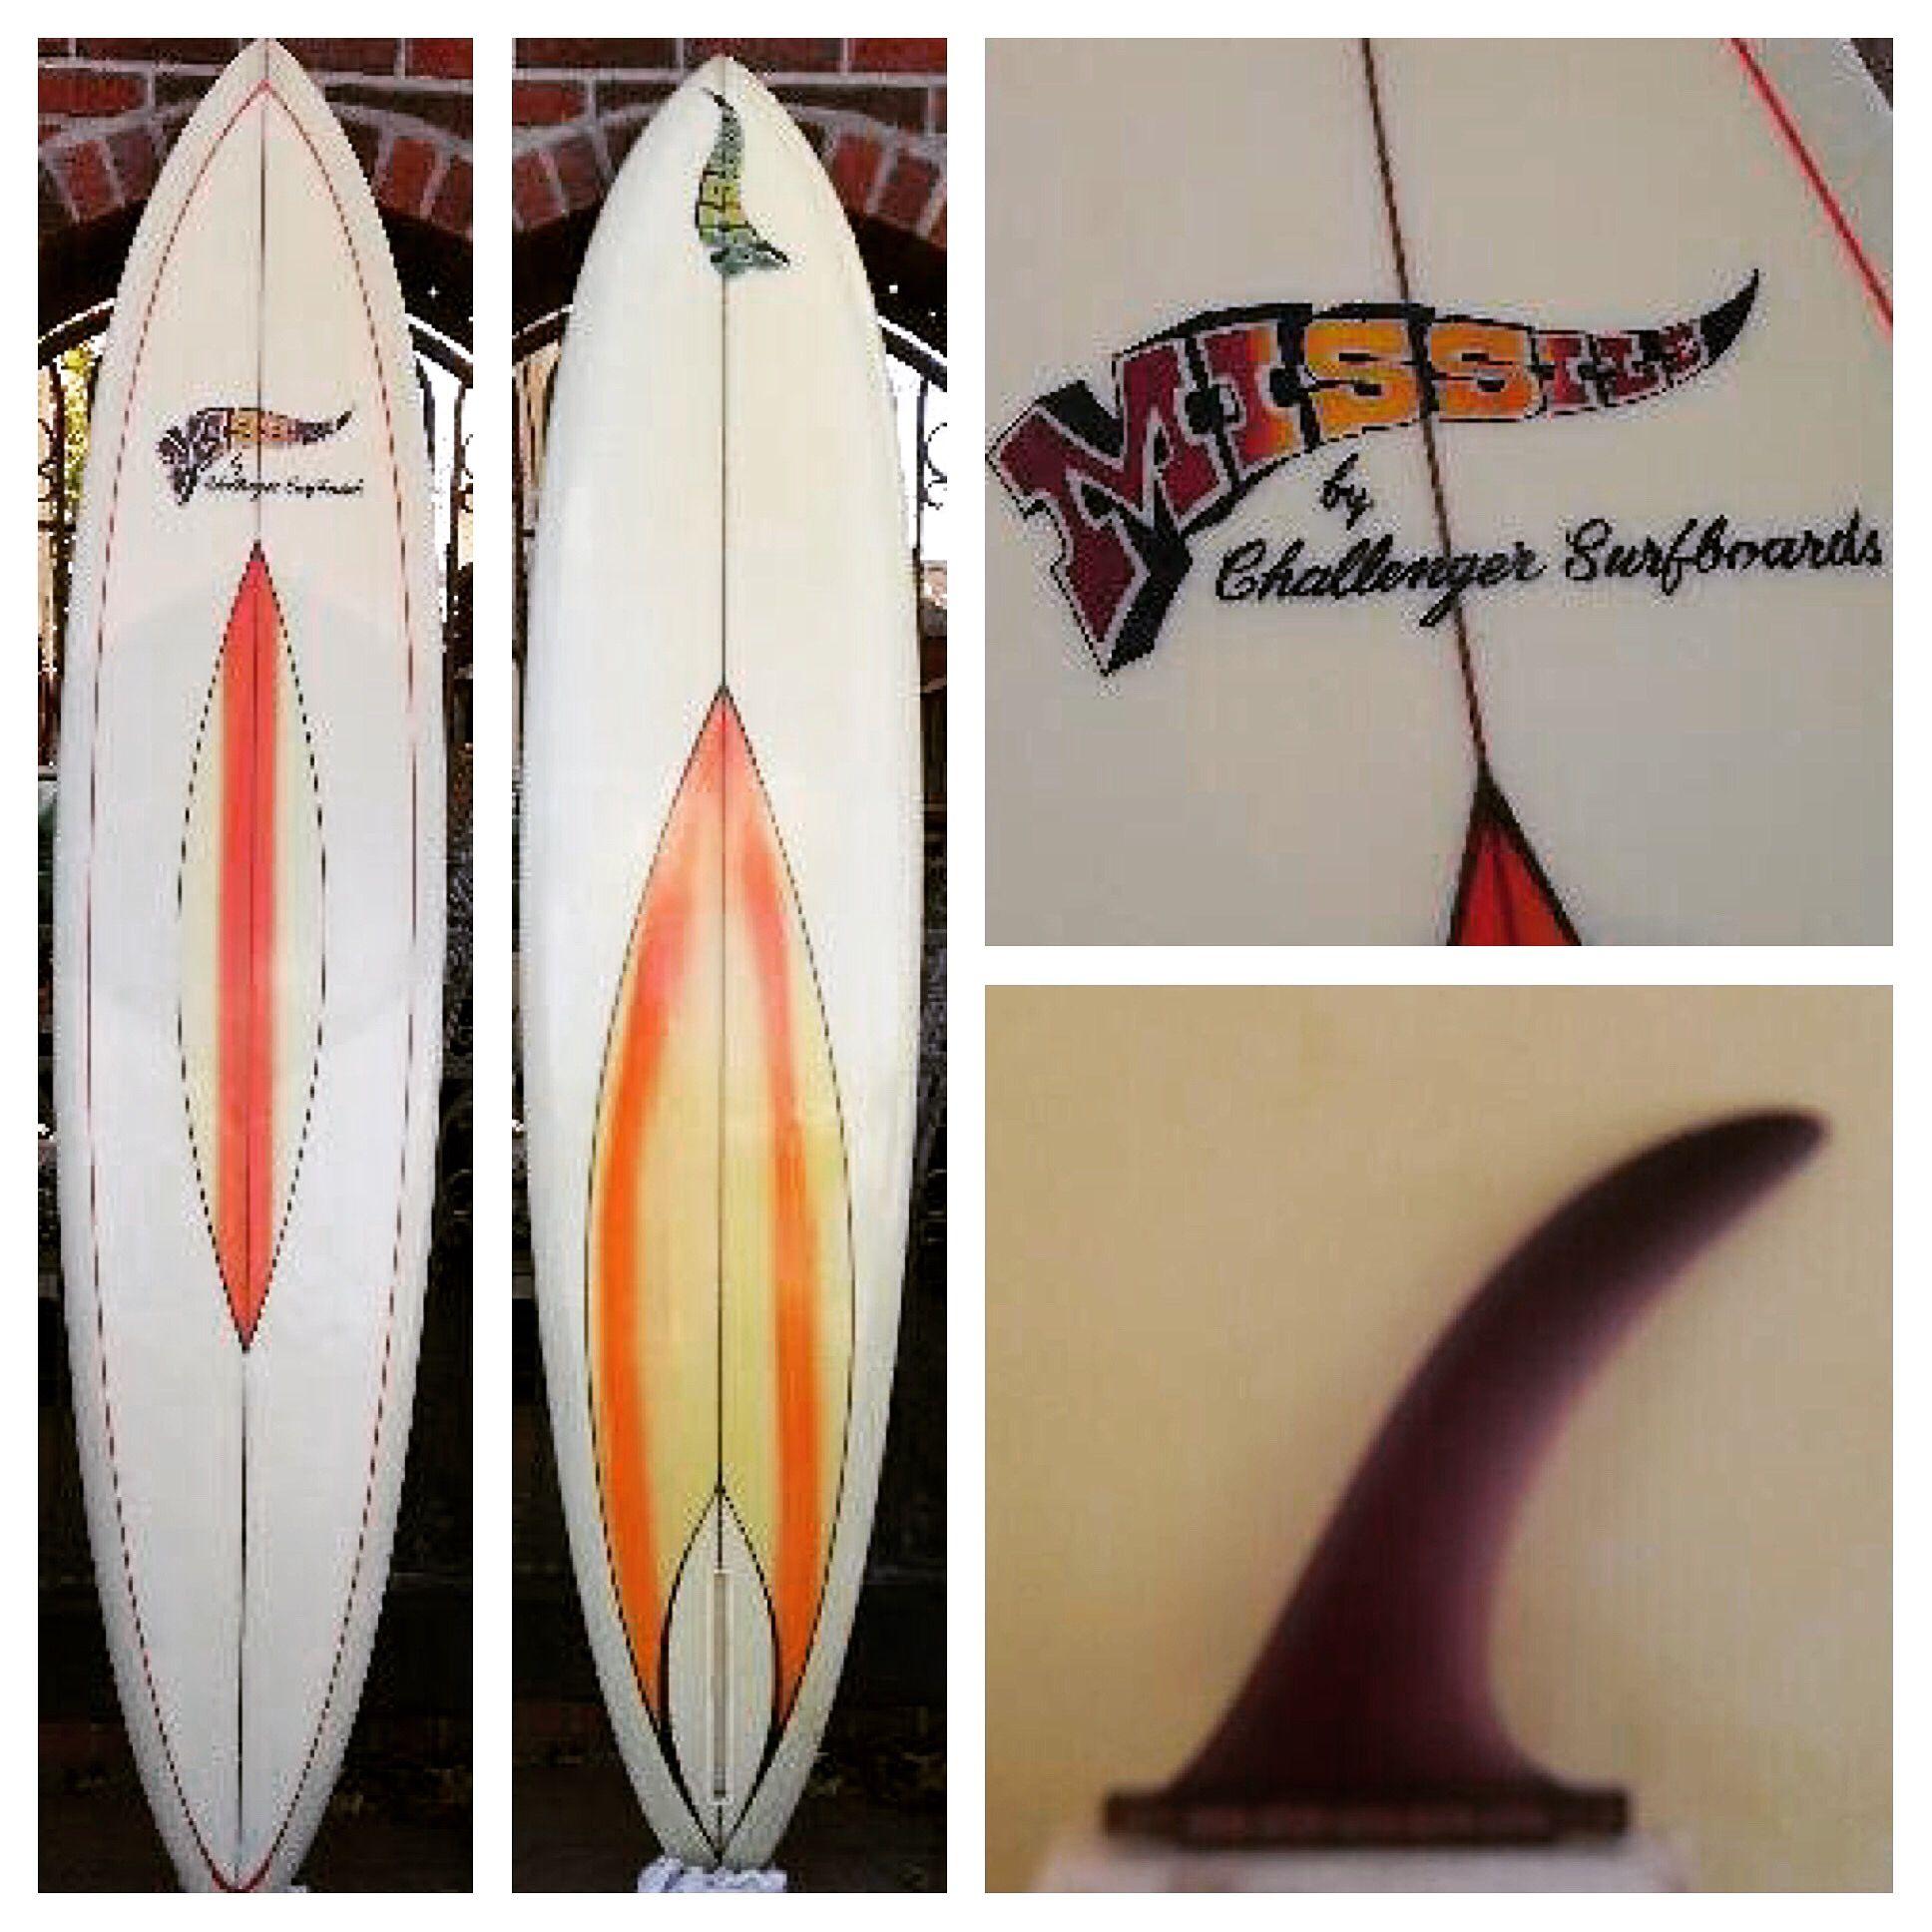 A 1968 Missile Model, By Challenger Surfboards, Vintage Surfboards